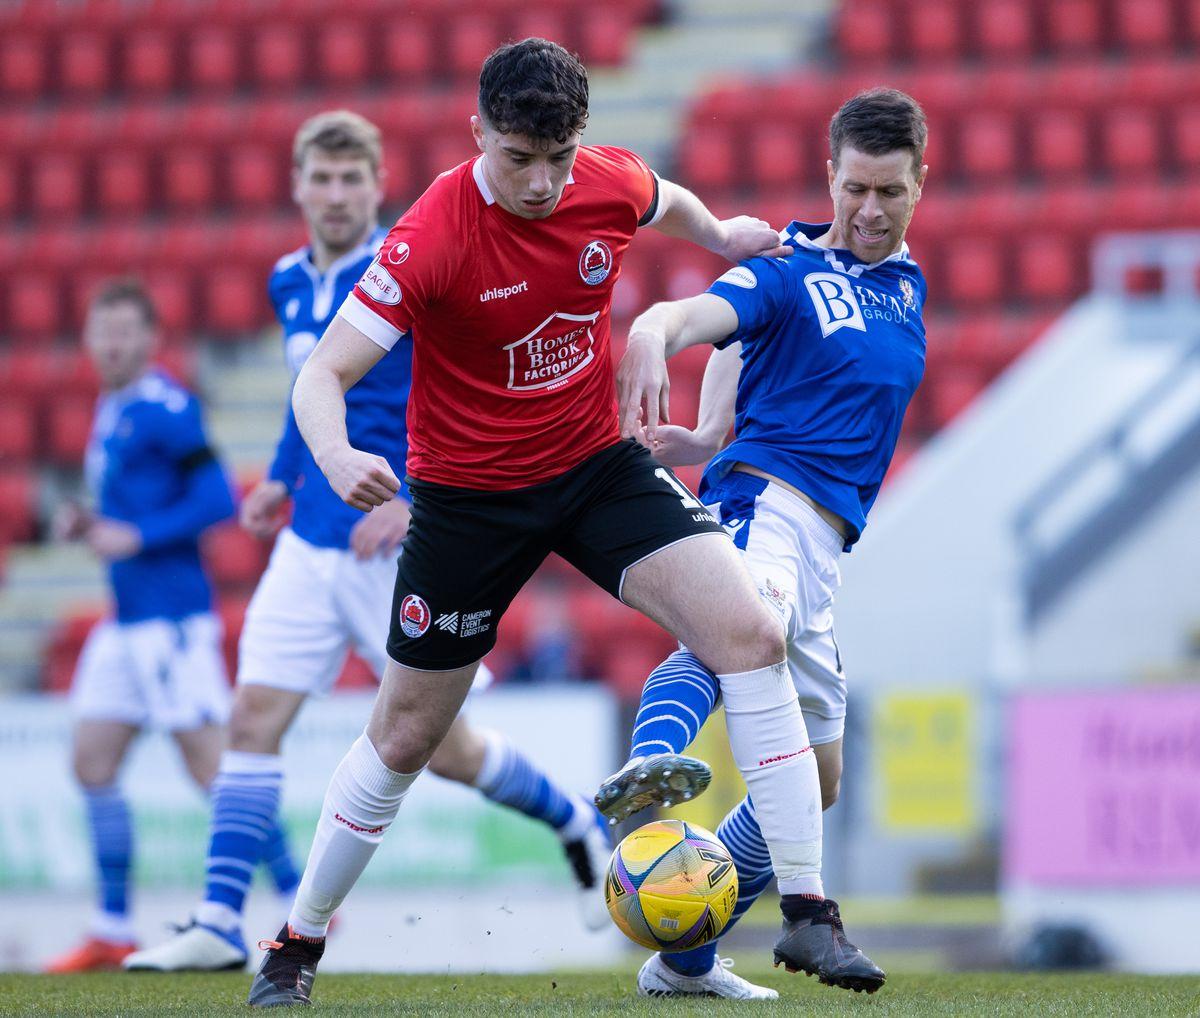 St Johnstone v Clyde - Scottish FA Cup